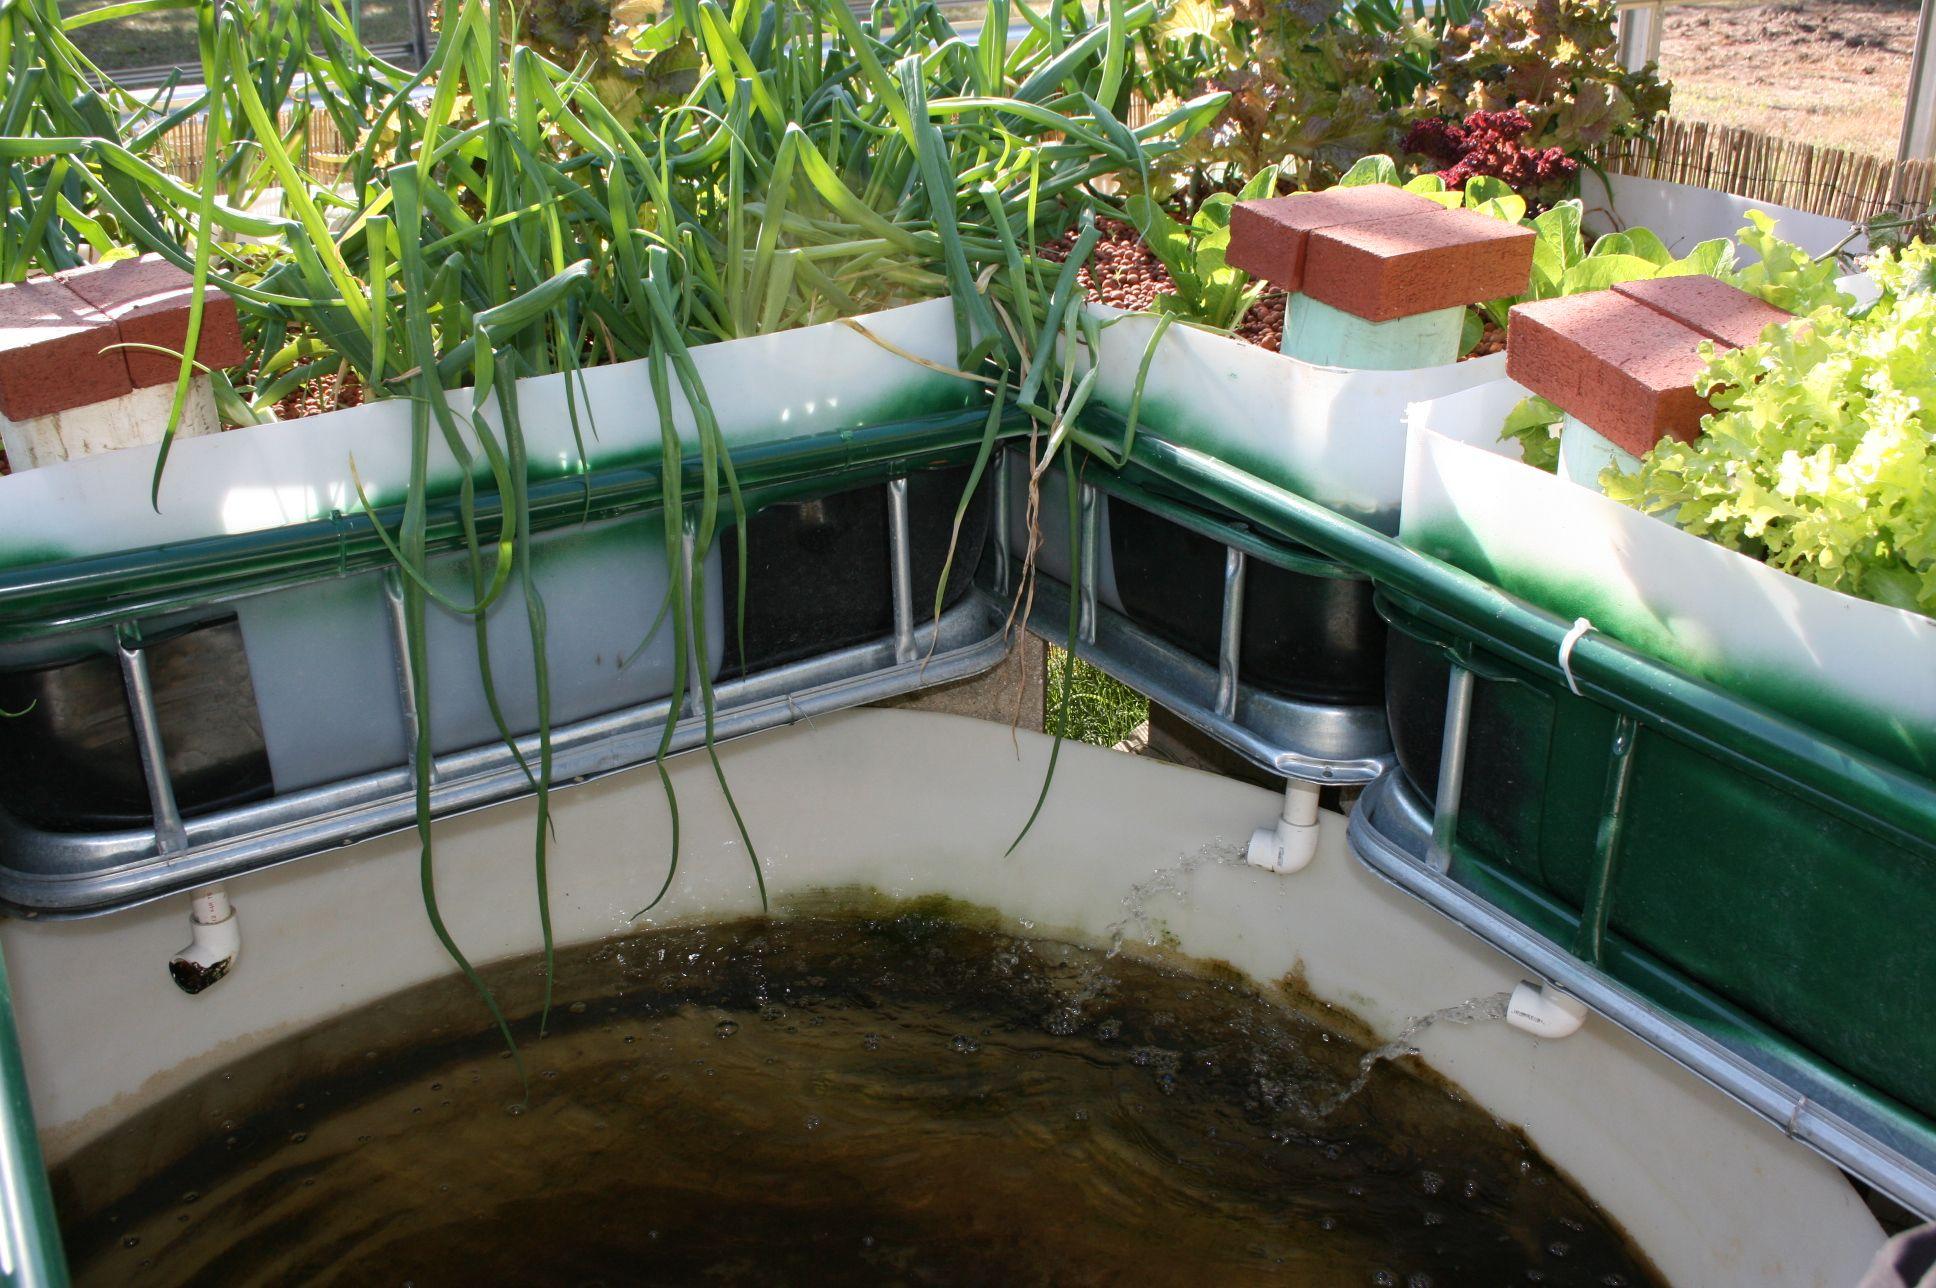 Backyard aquaponics garden center save planet earth for Fish aquaponics garden